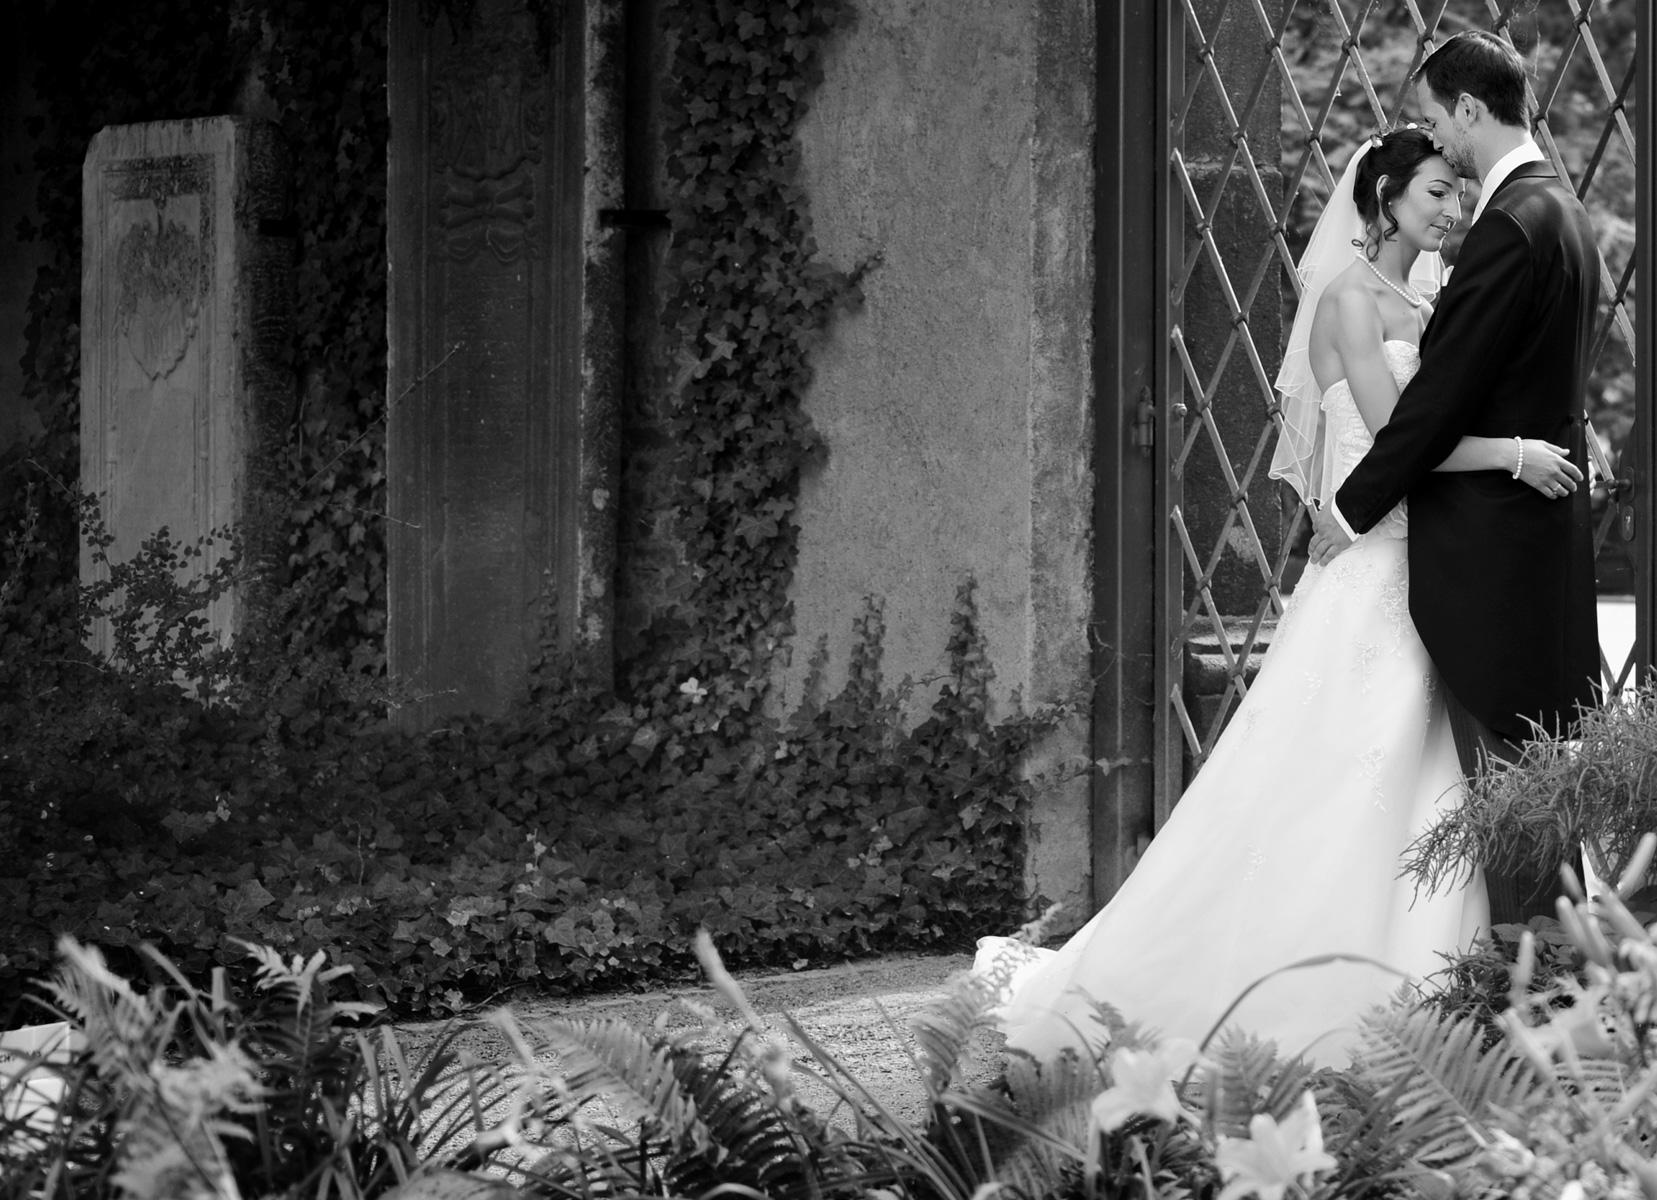 Hochzeitsfotografie-Nicole-Bouillon_Nicole-Bouillon-Fotografie40